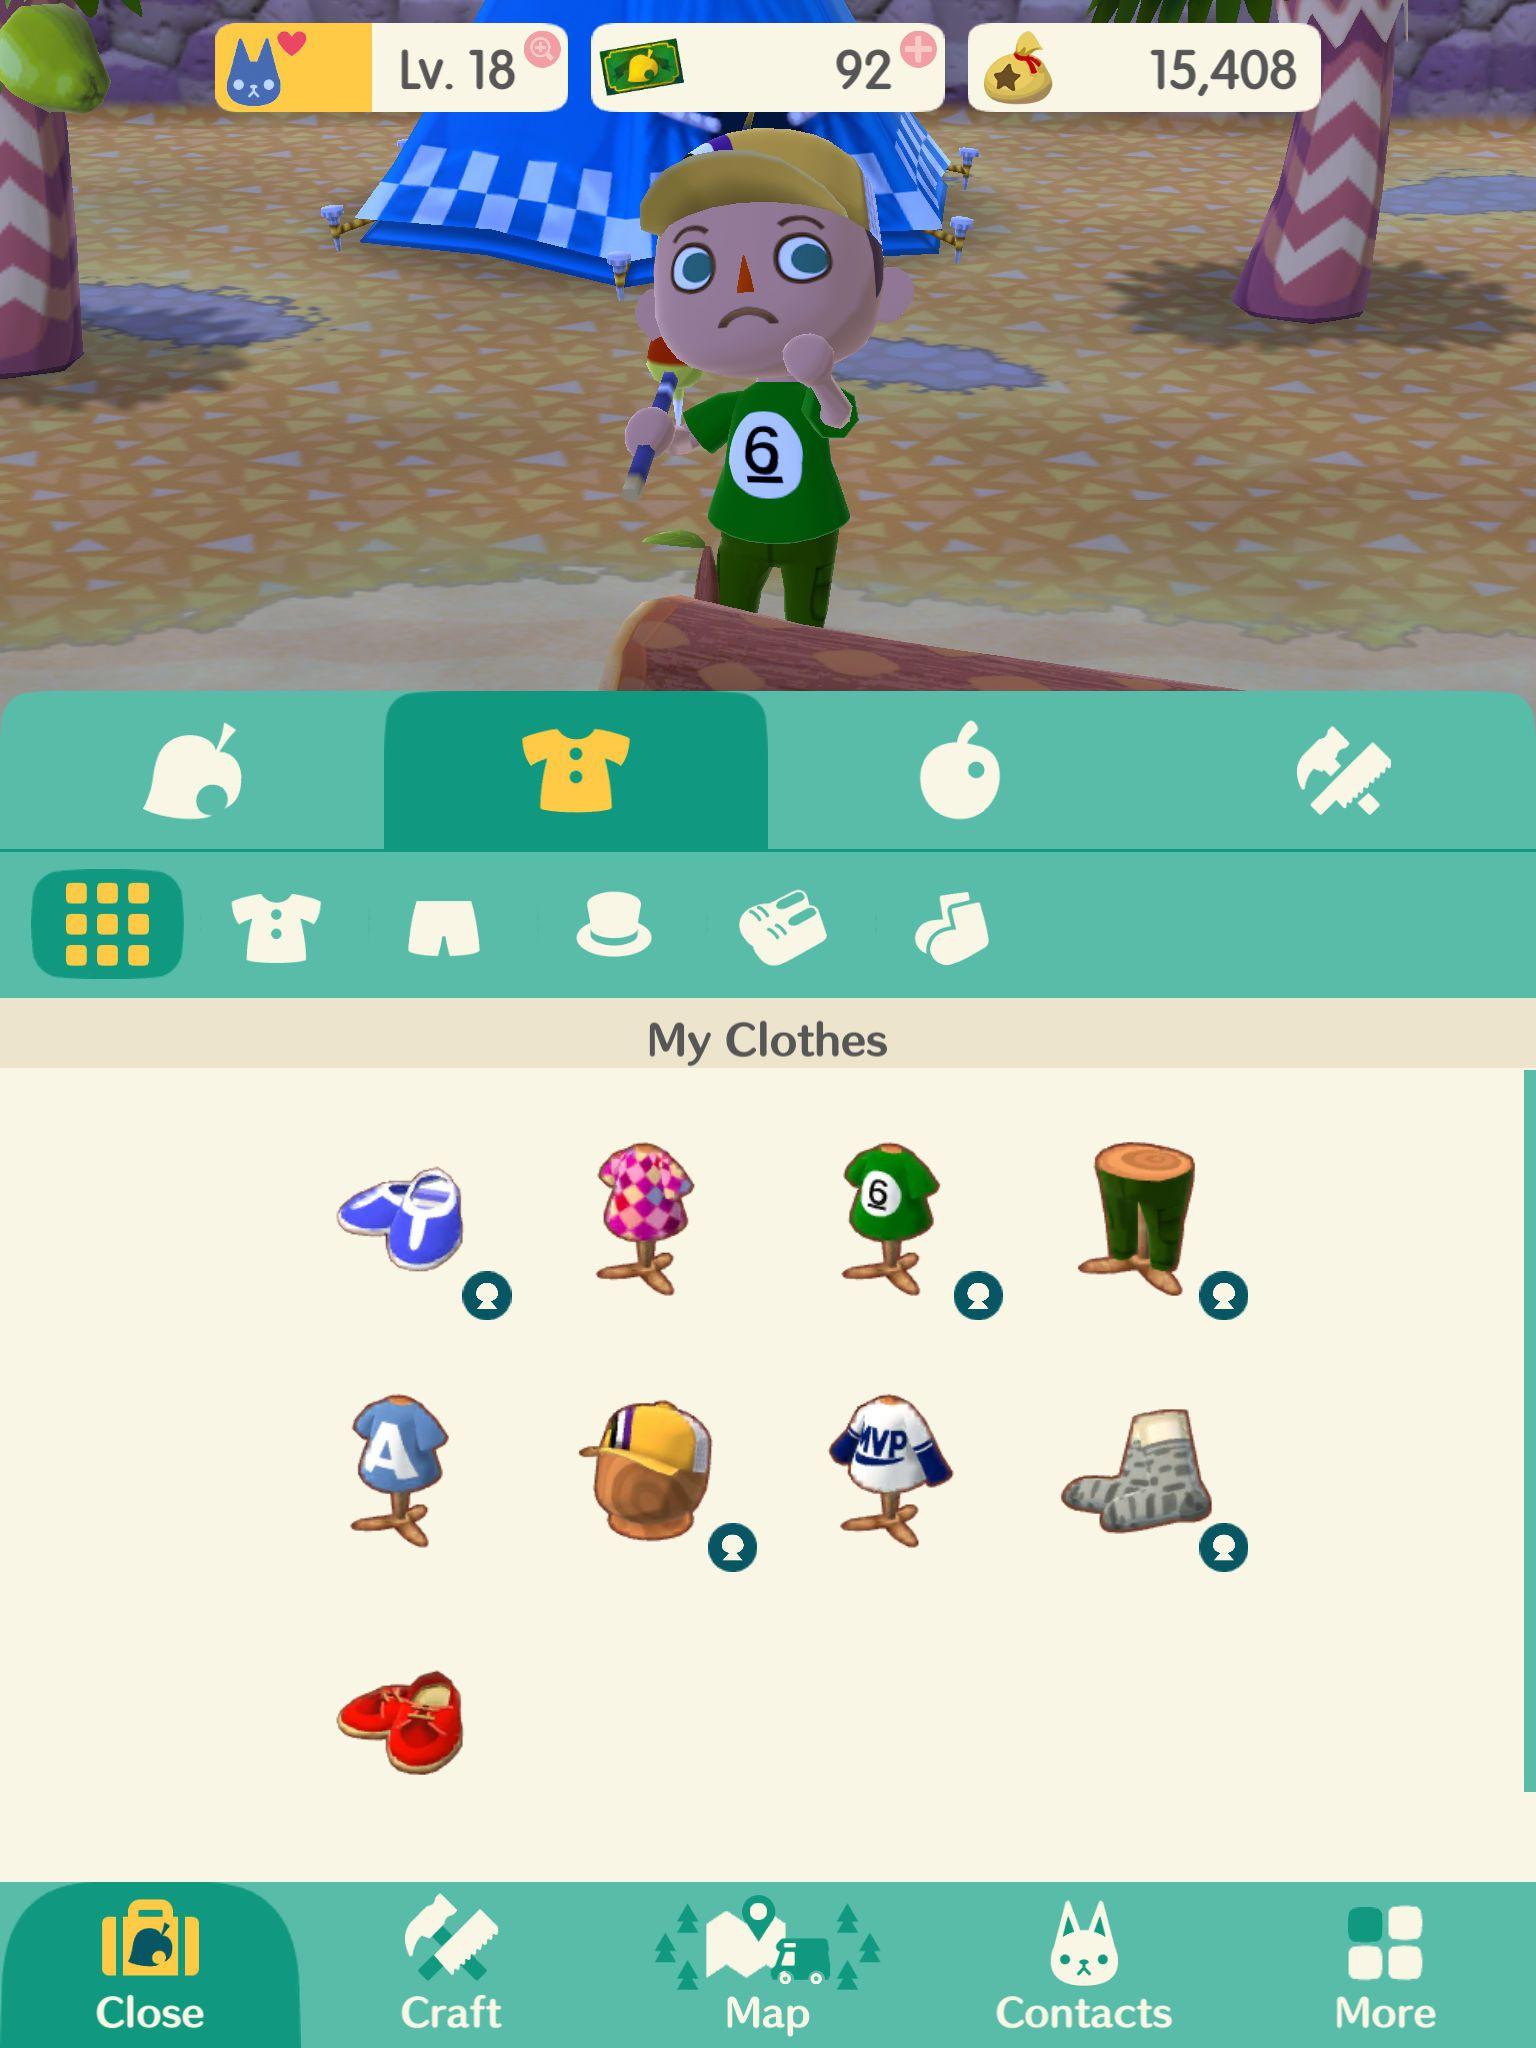 Kartinki Po Zaprosu Pocket Camp With Images Animal Crossing